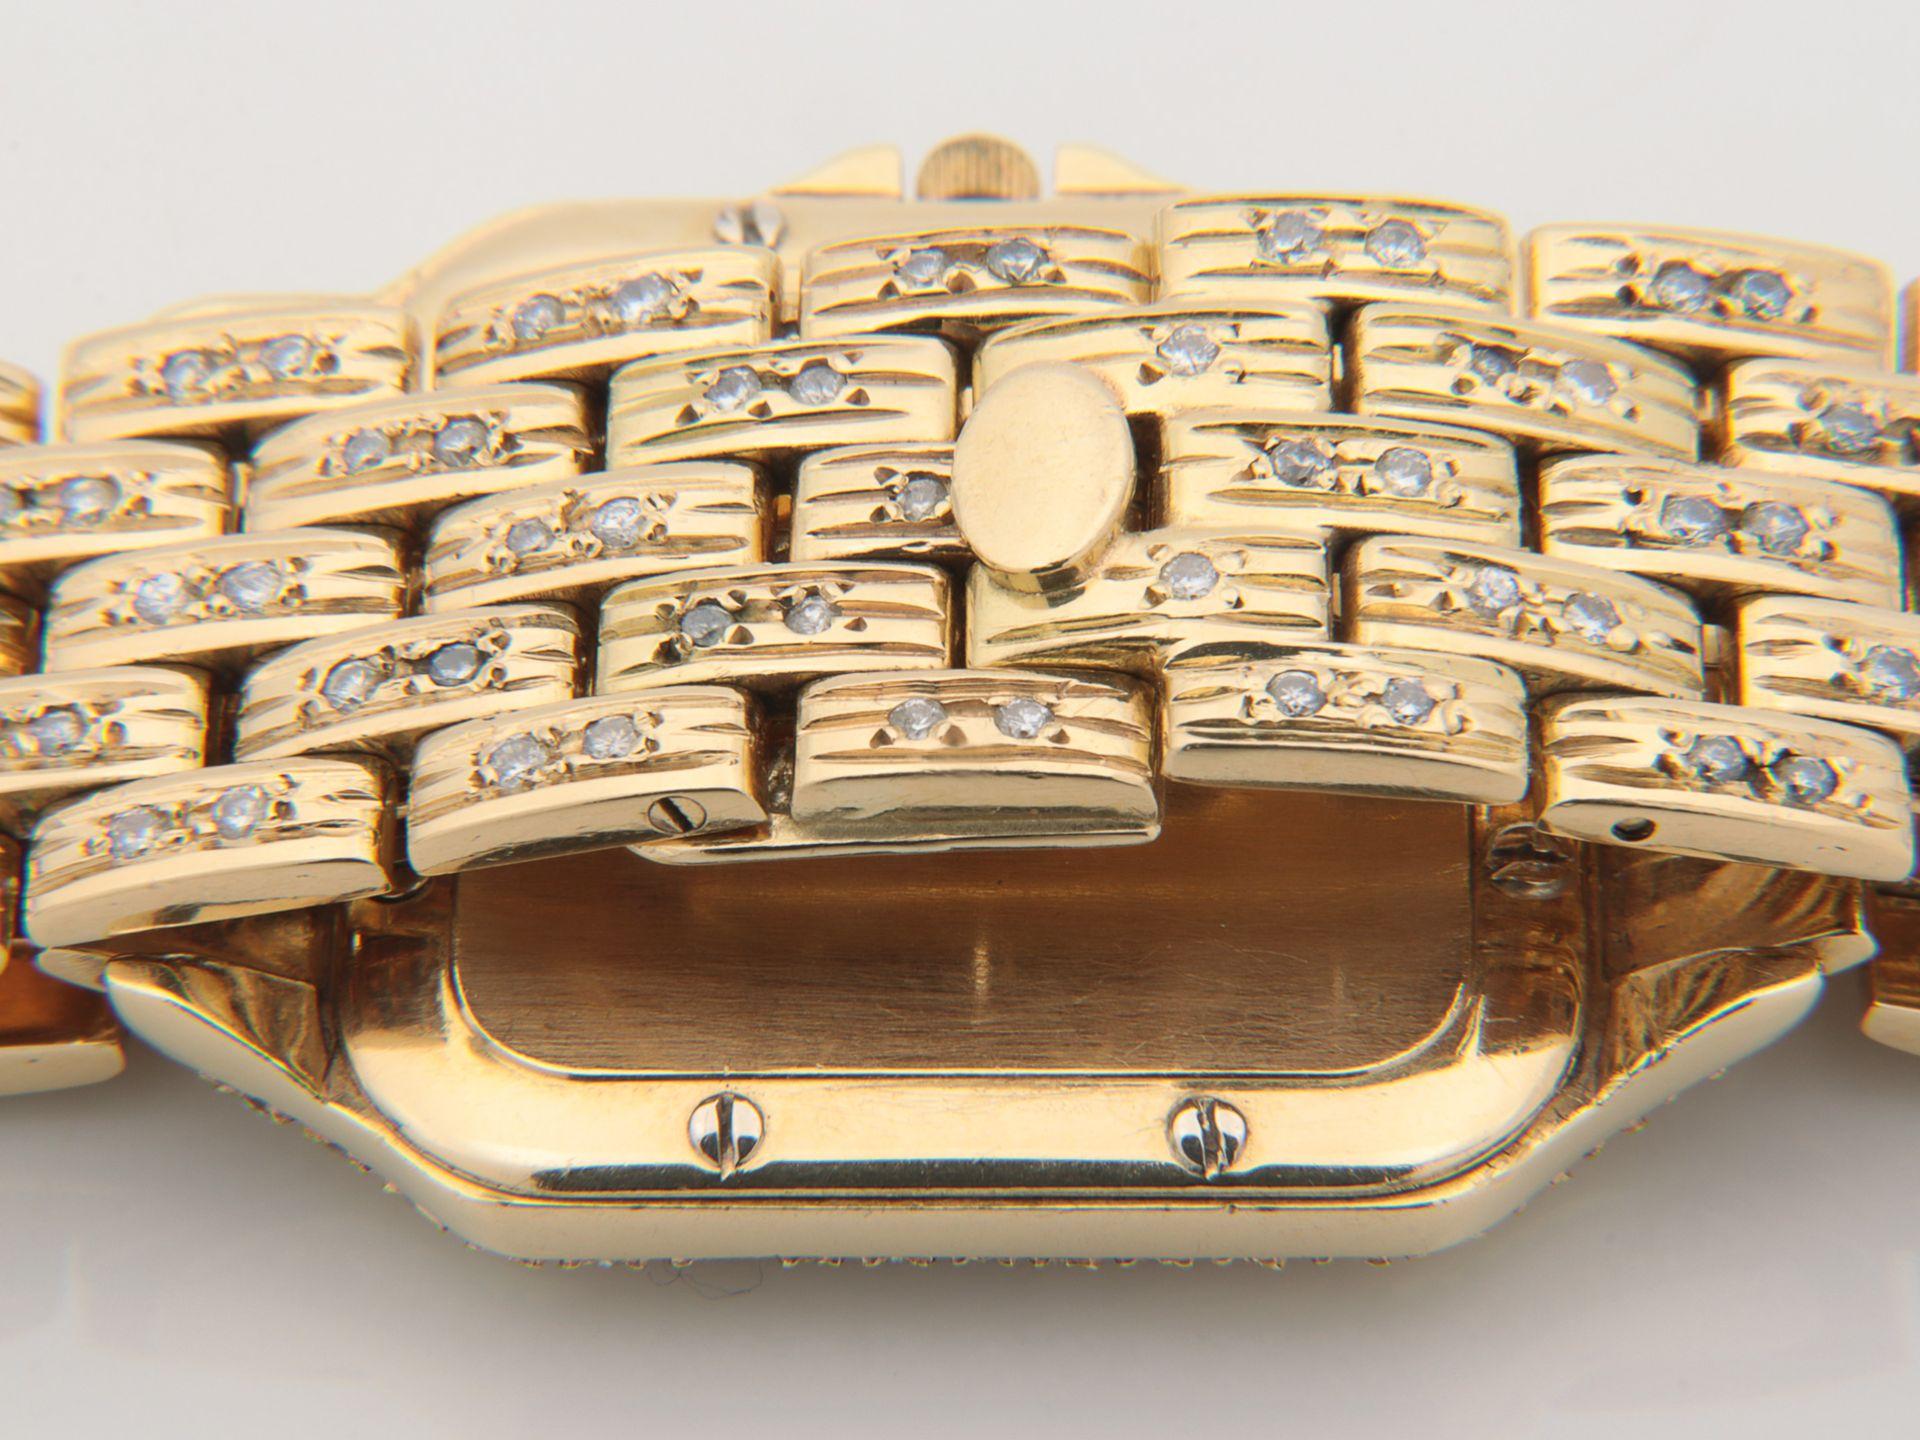 Cartier - Damenarmbanduhr - Image 6 of 14